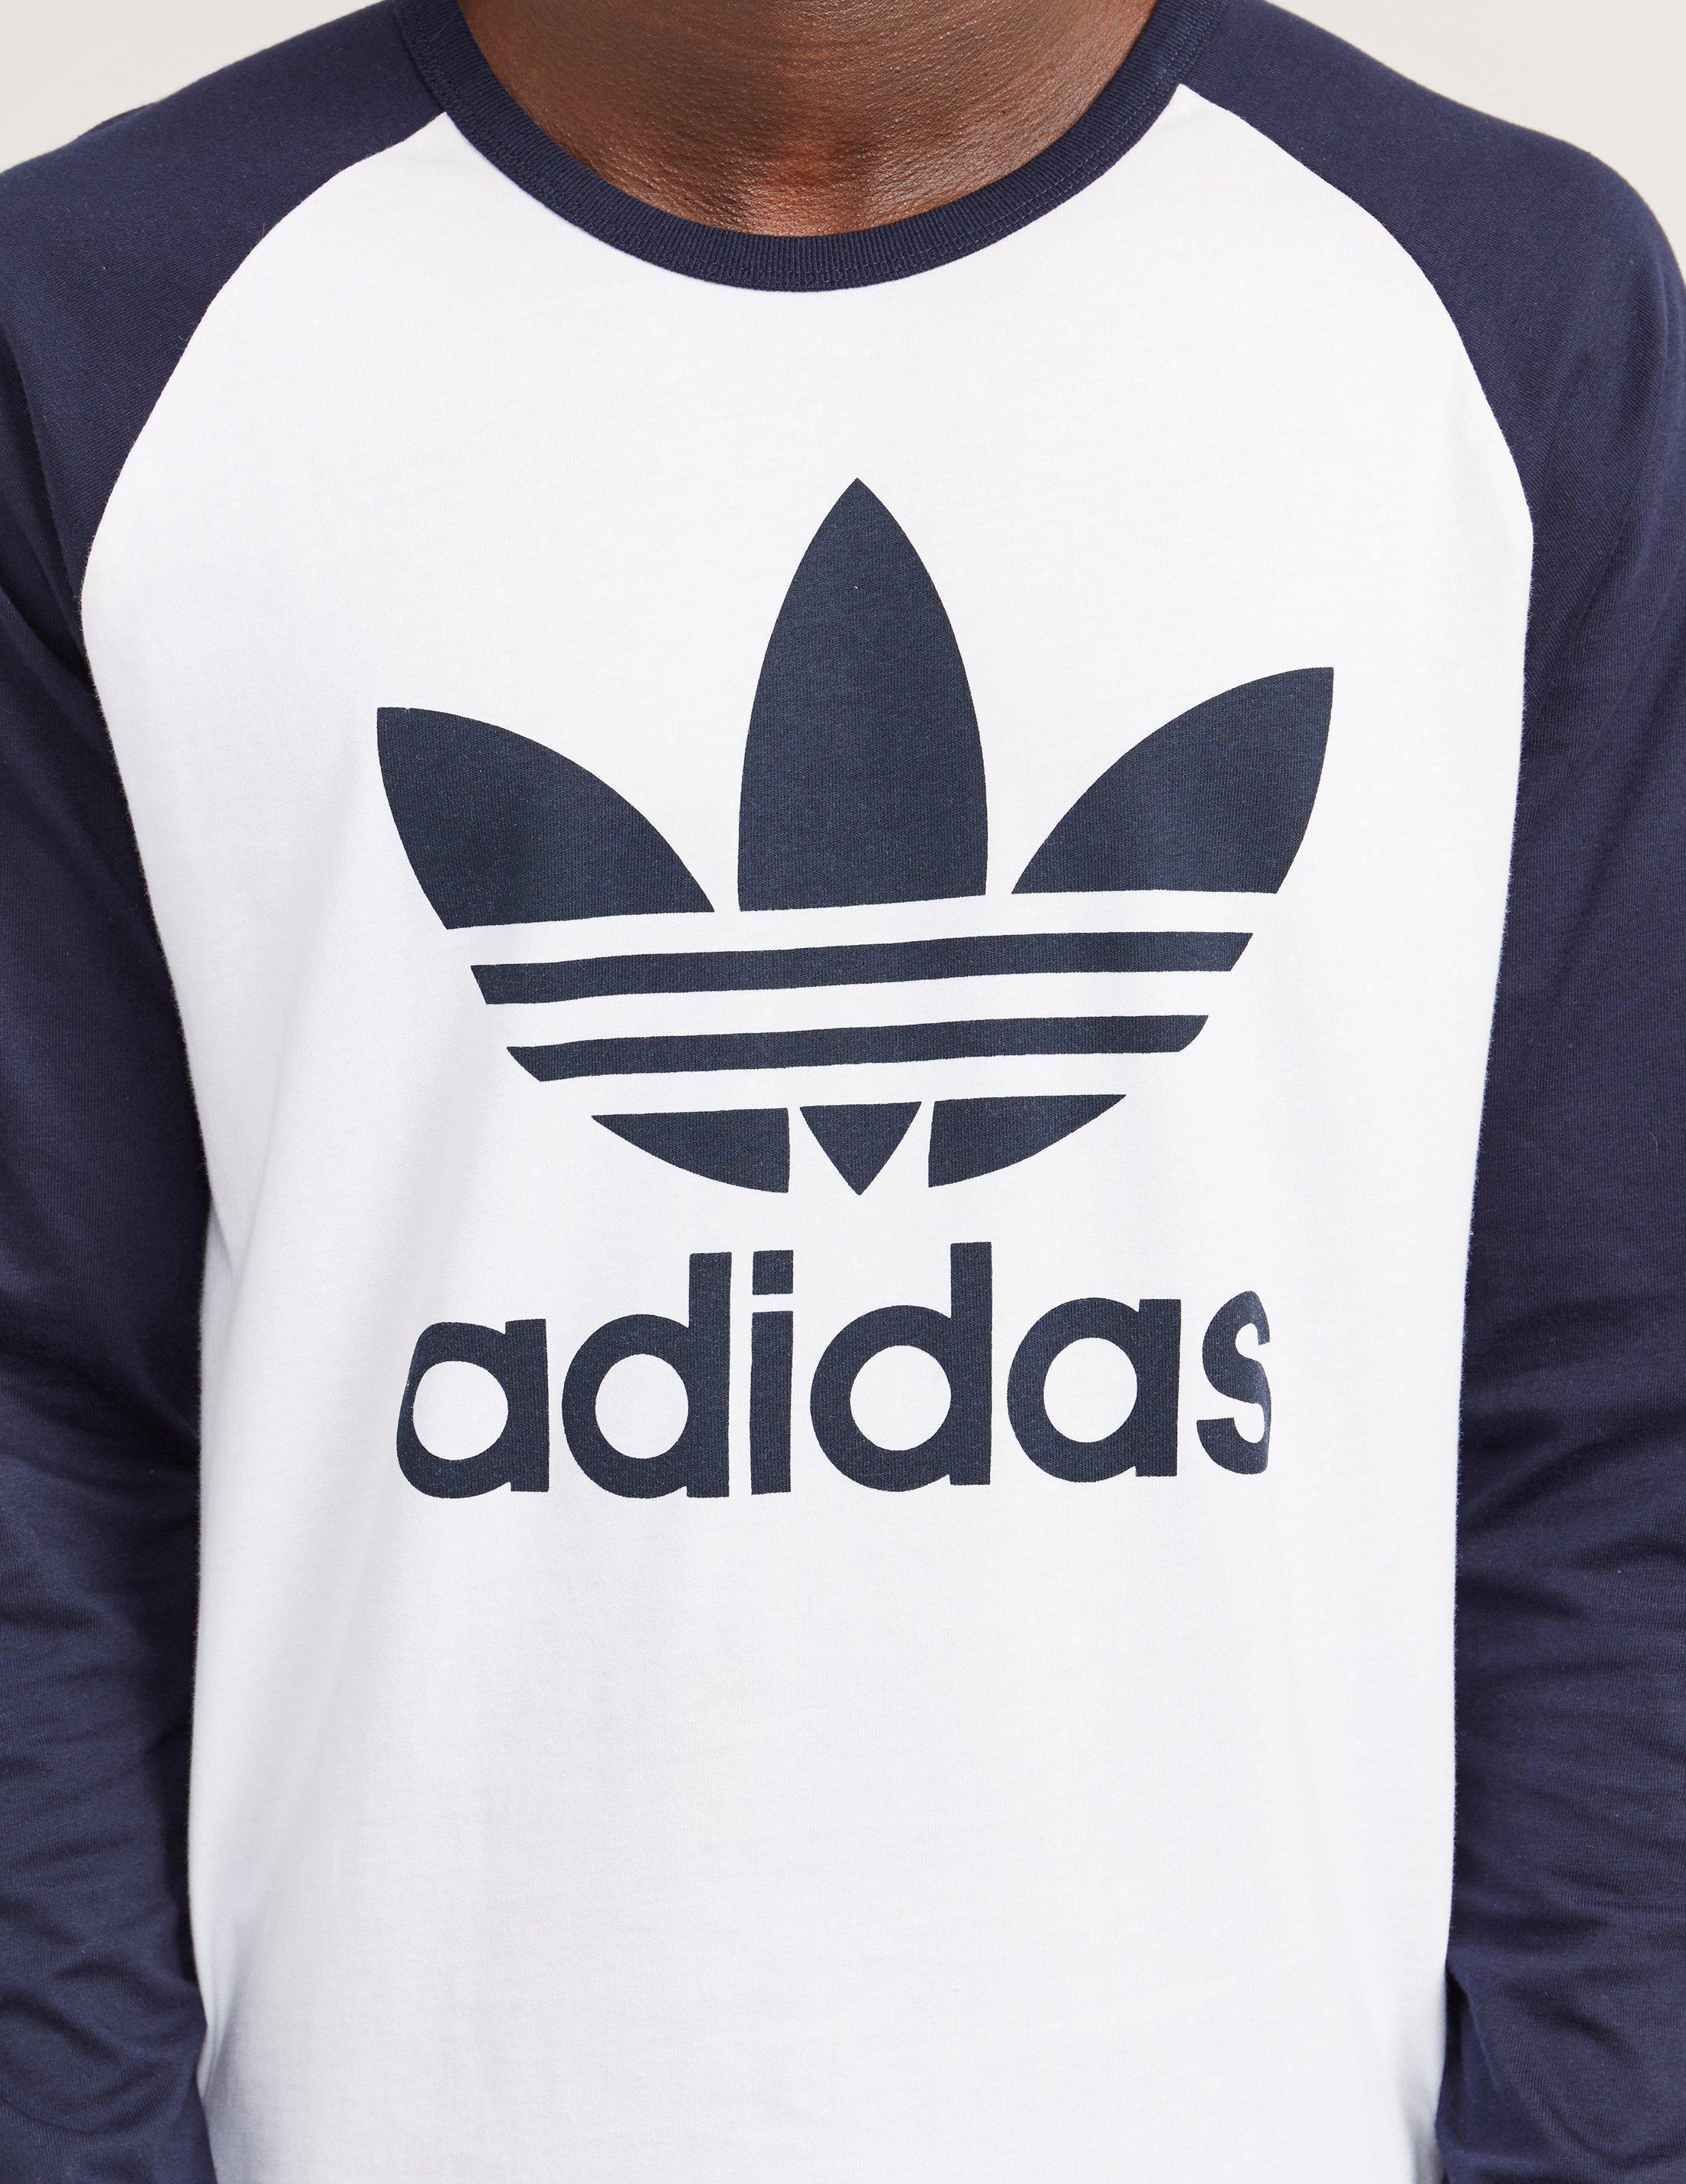 Adidas Originals Long Sleeve Trefoil T Shirt In Blue For